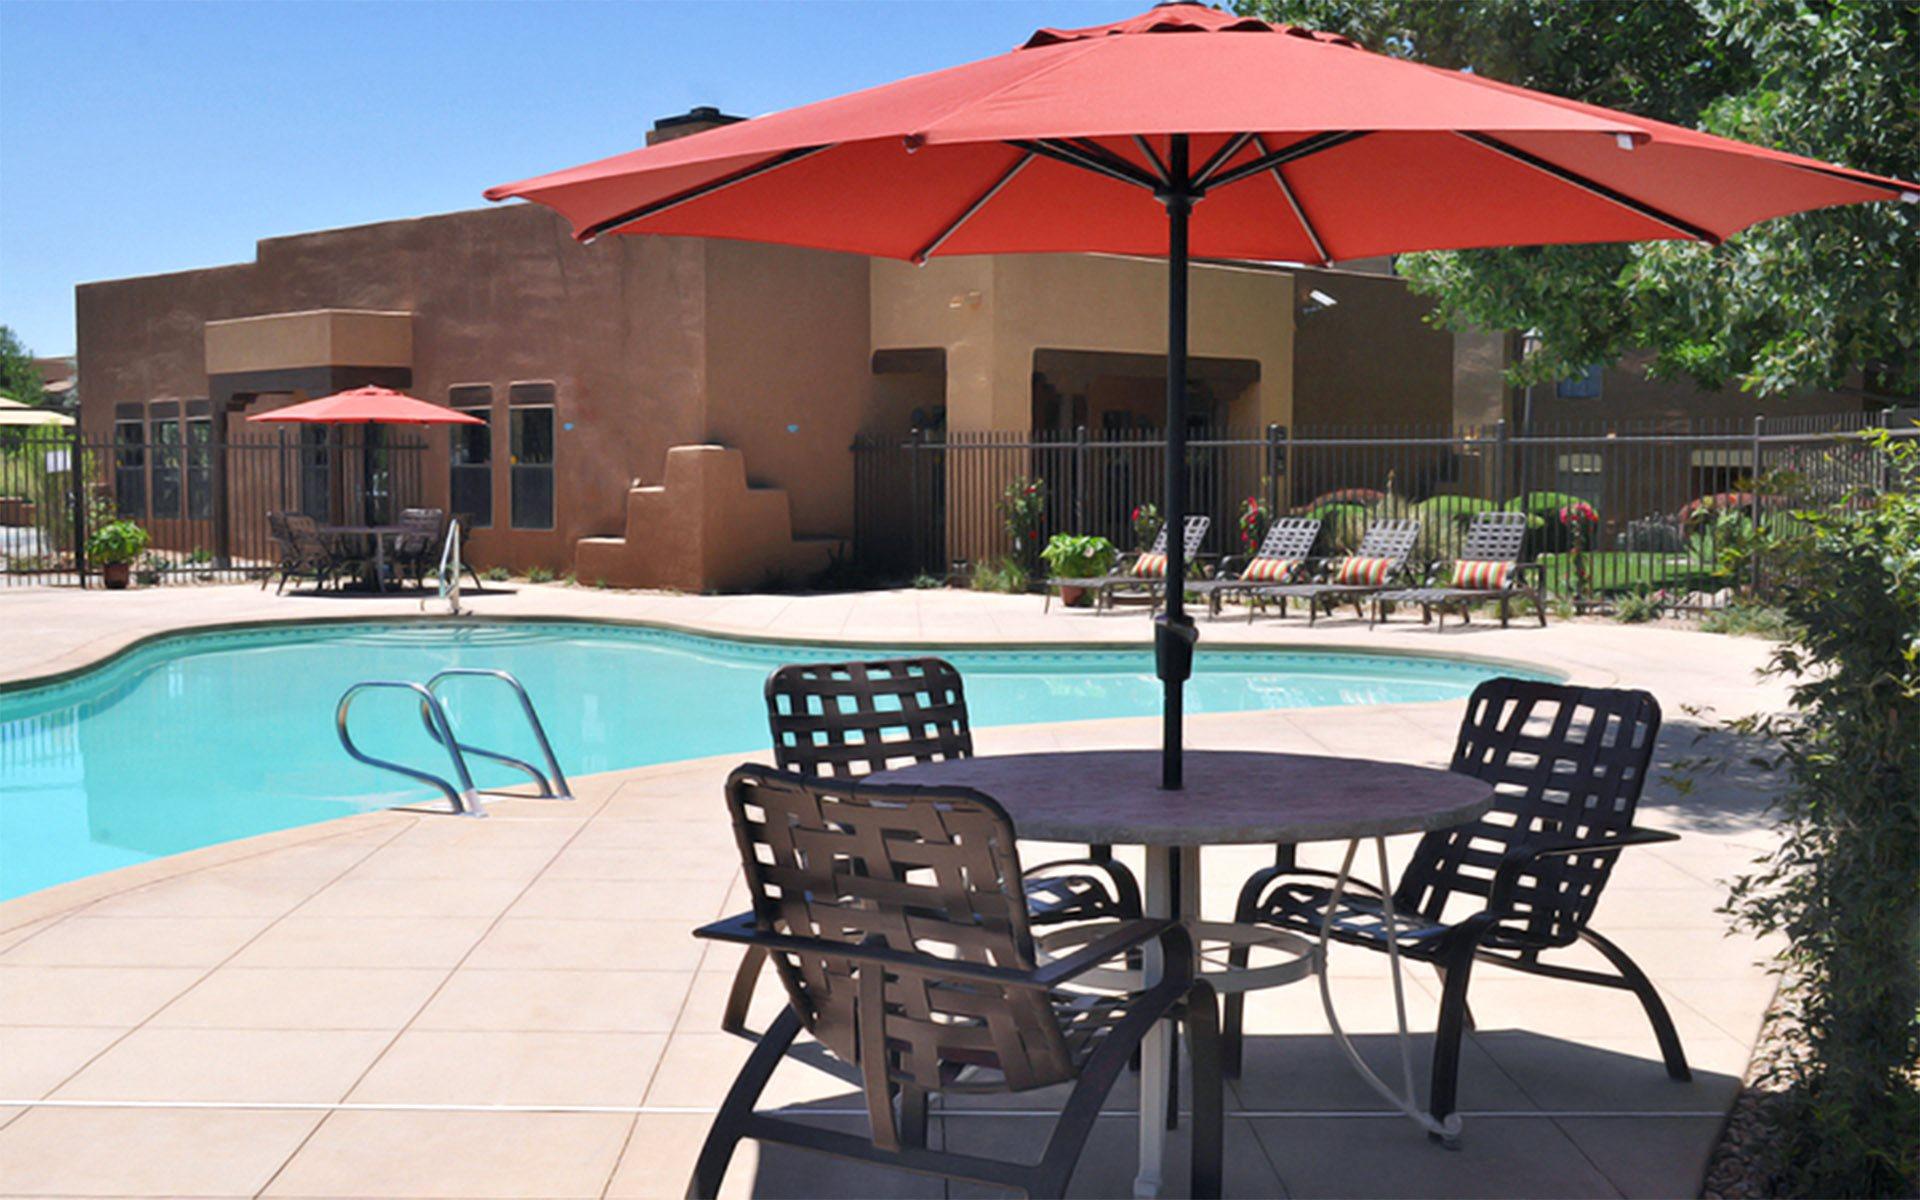 Rancho Carrera Apartments Apartment Homes Located In Santa Fe Nm